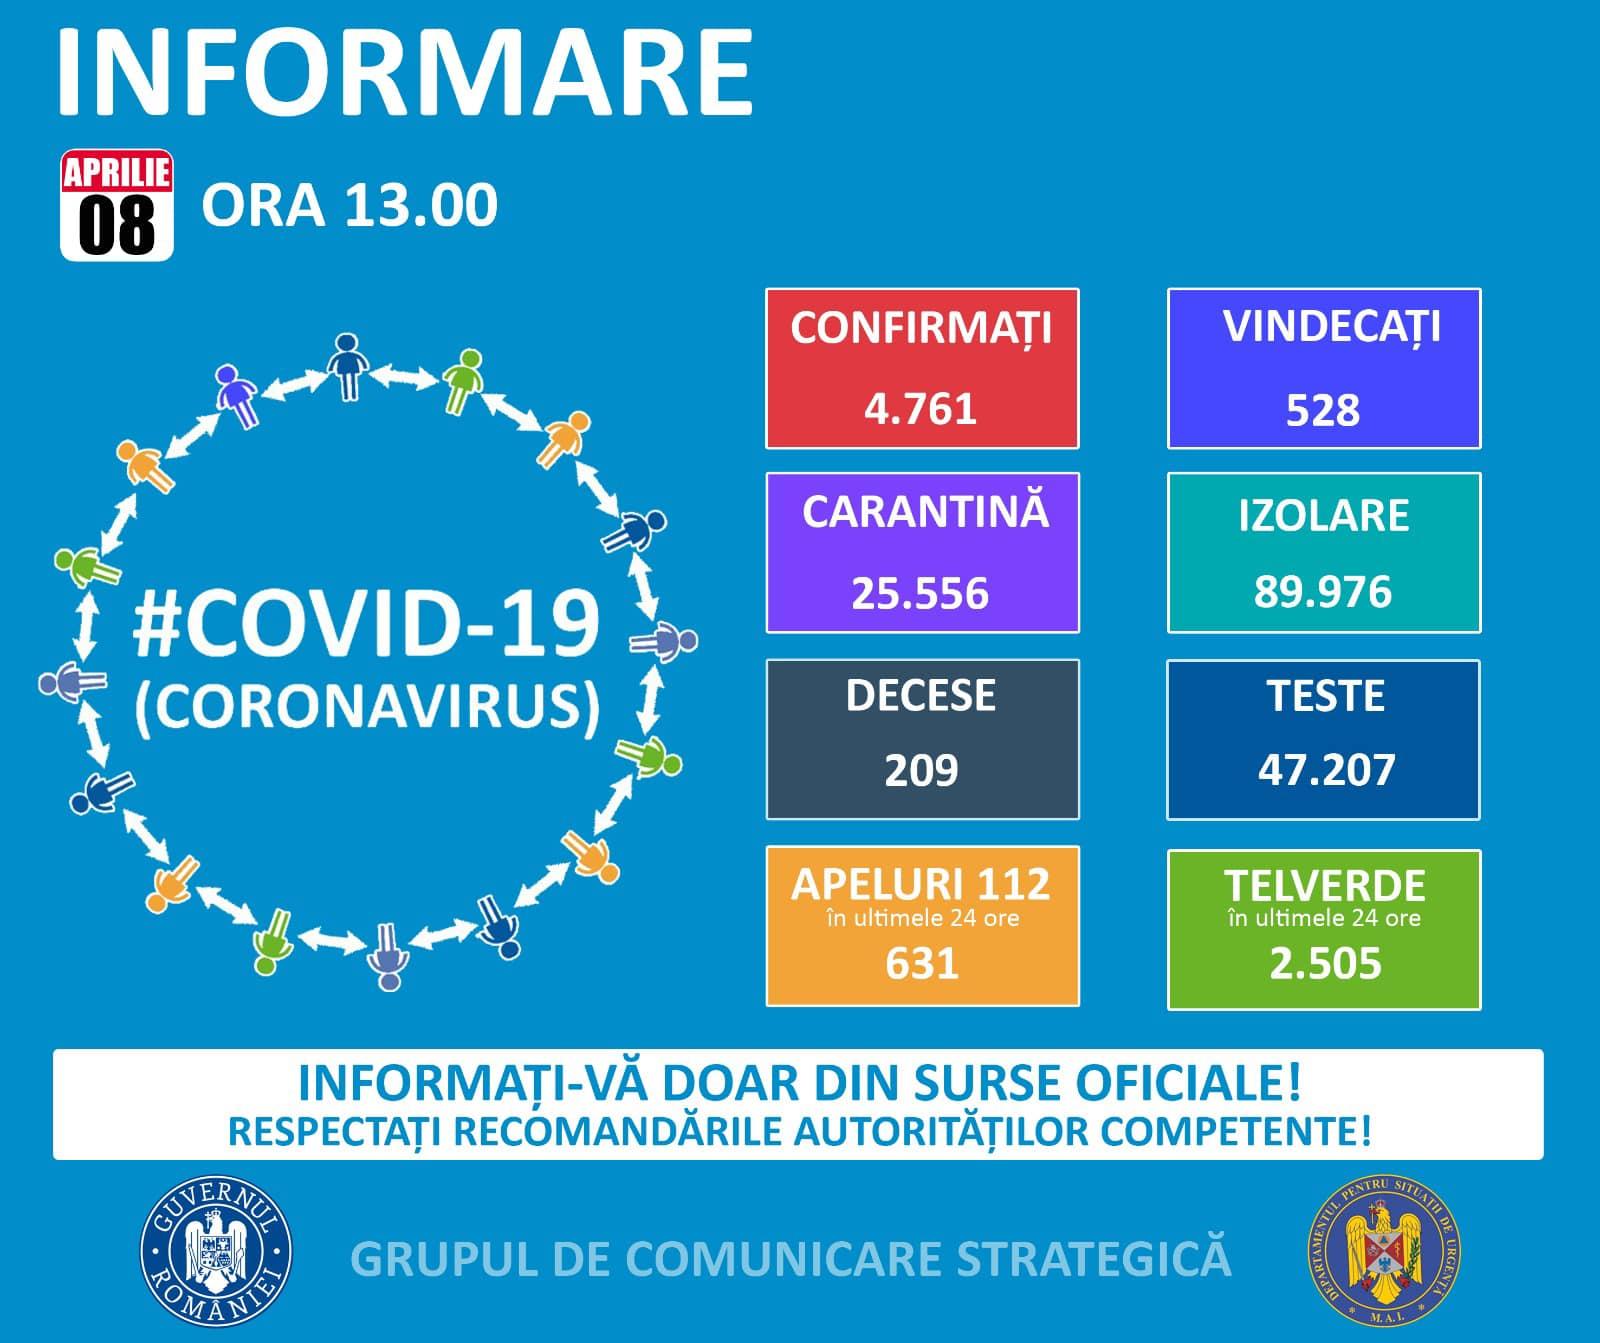 Coronavirus Romania situatie 8 aprilie 2020